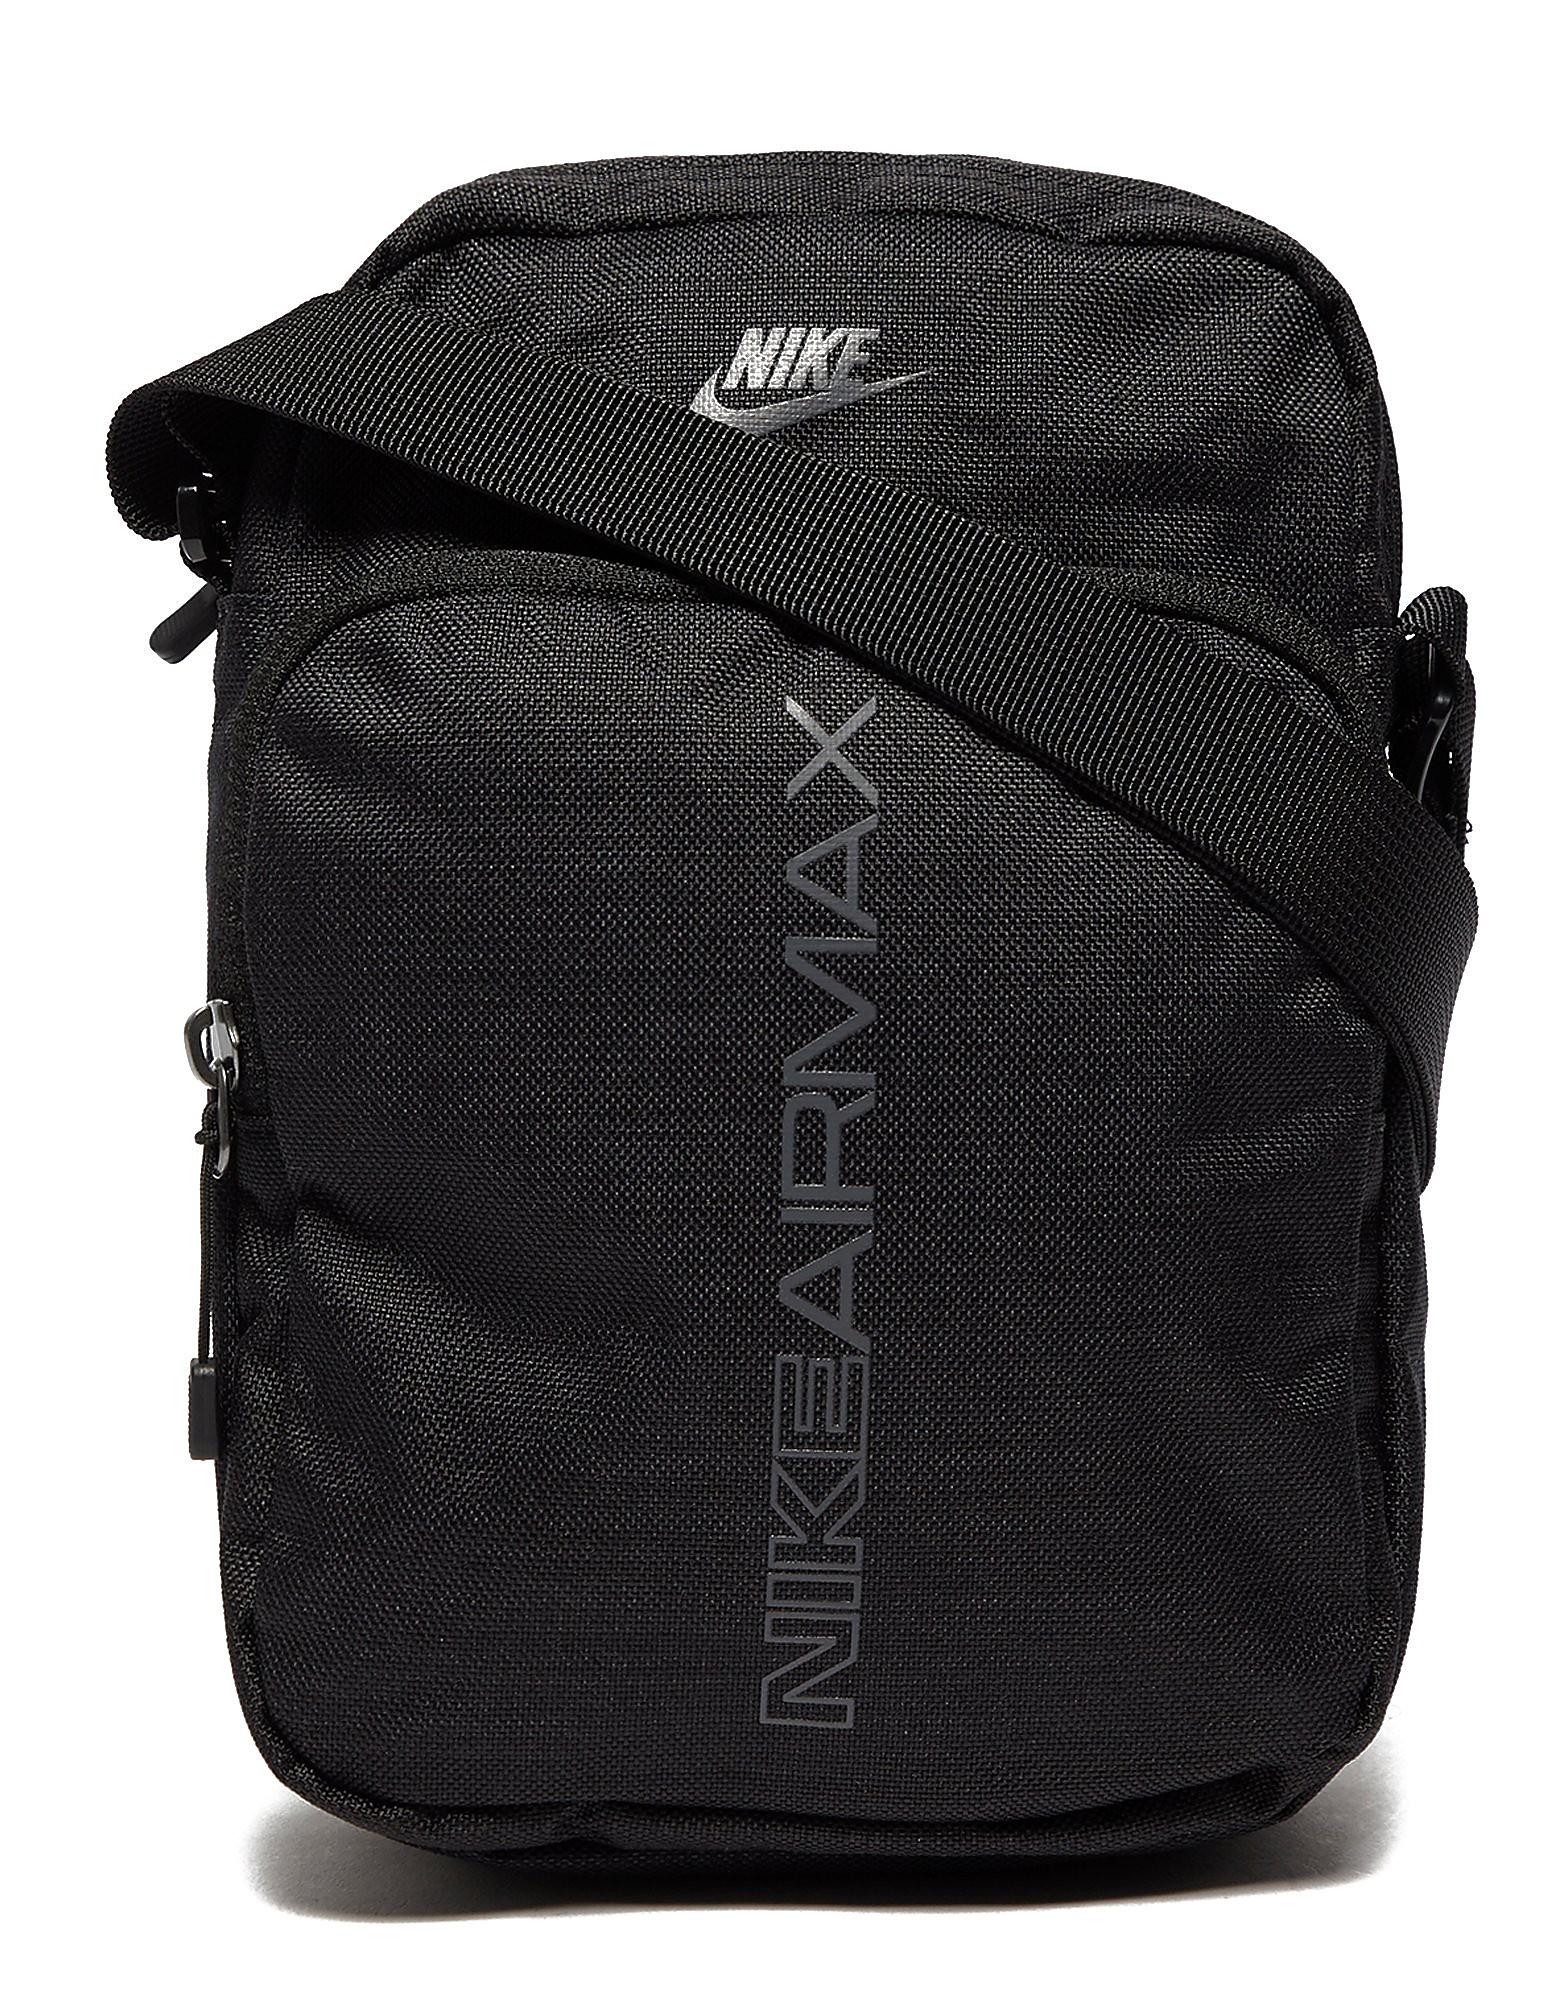 Nike Air Max Small Bag